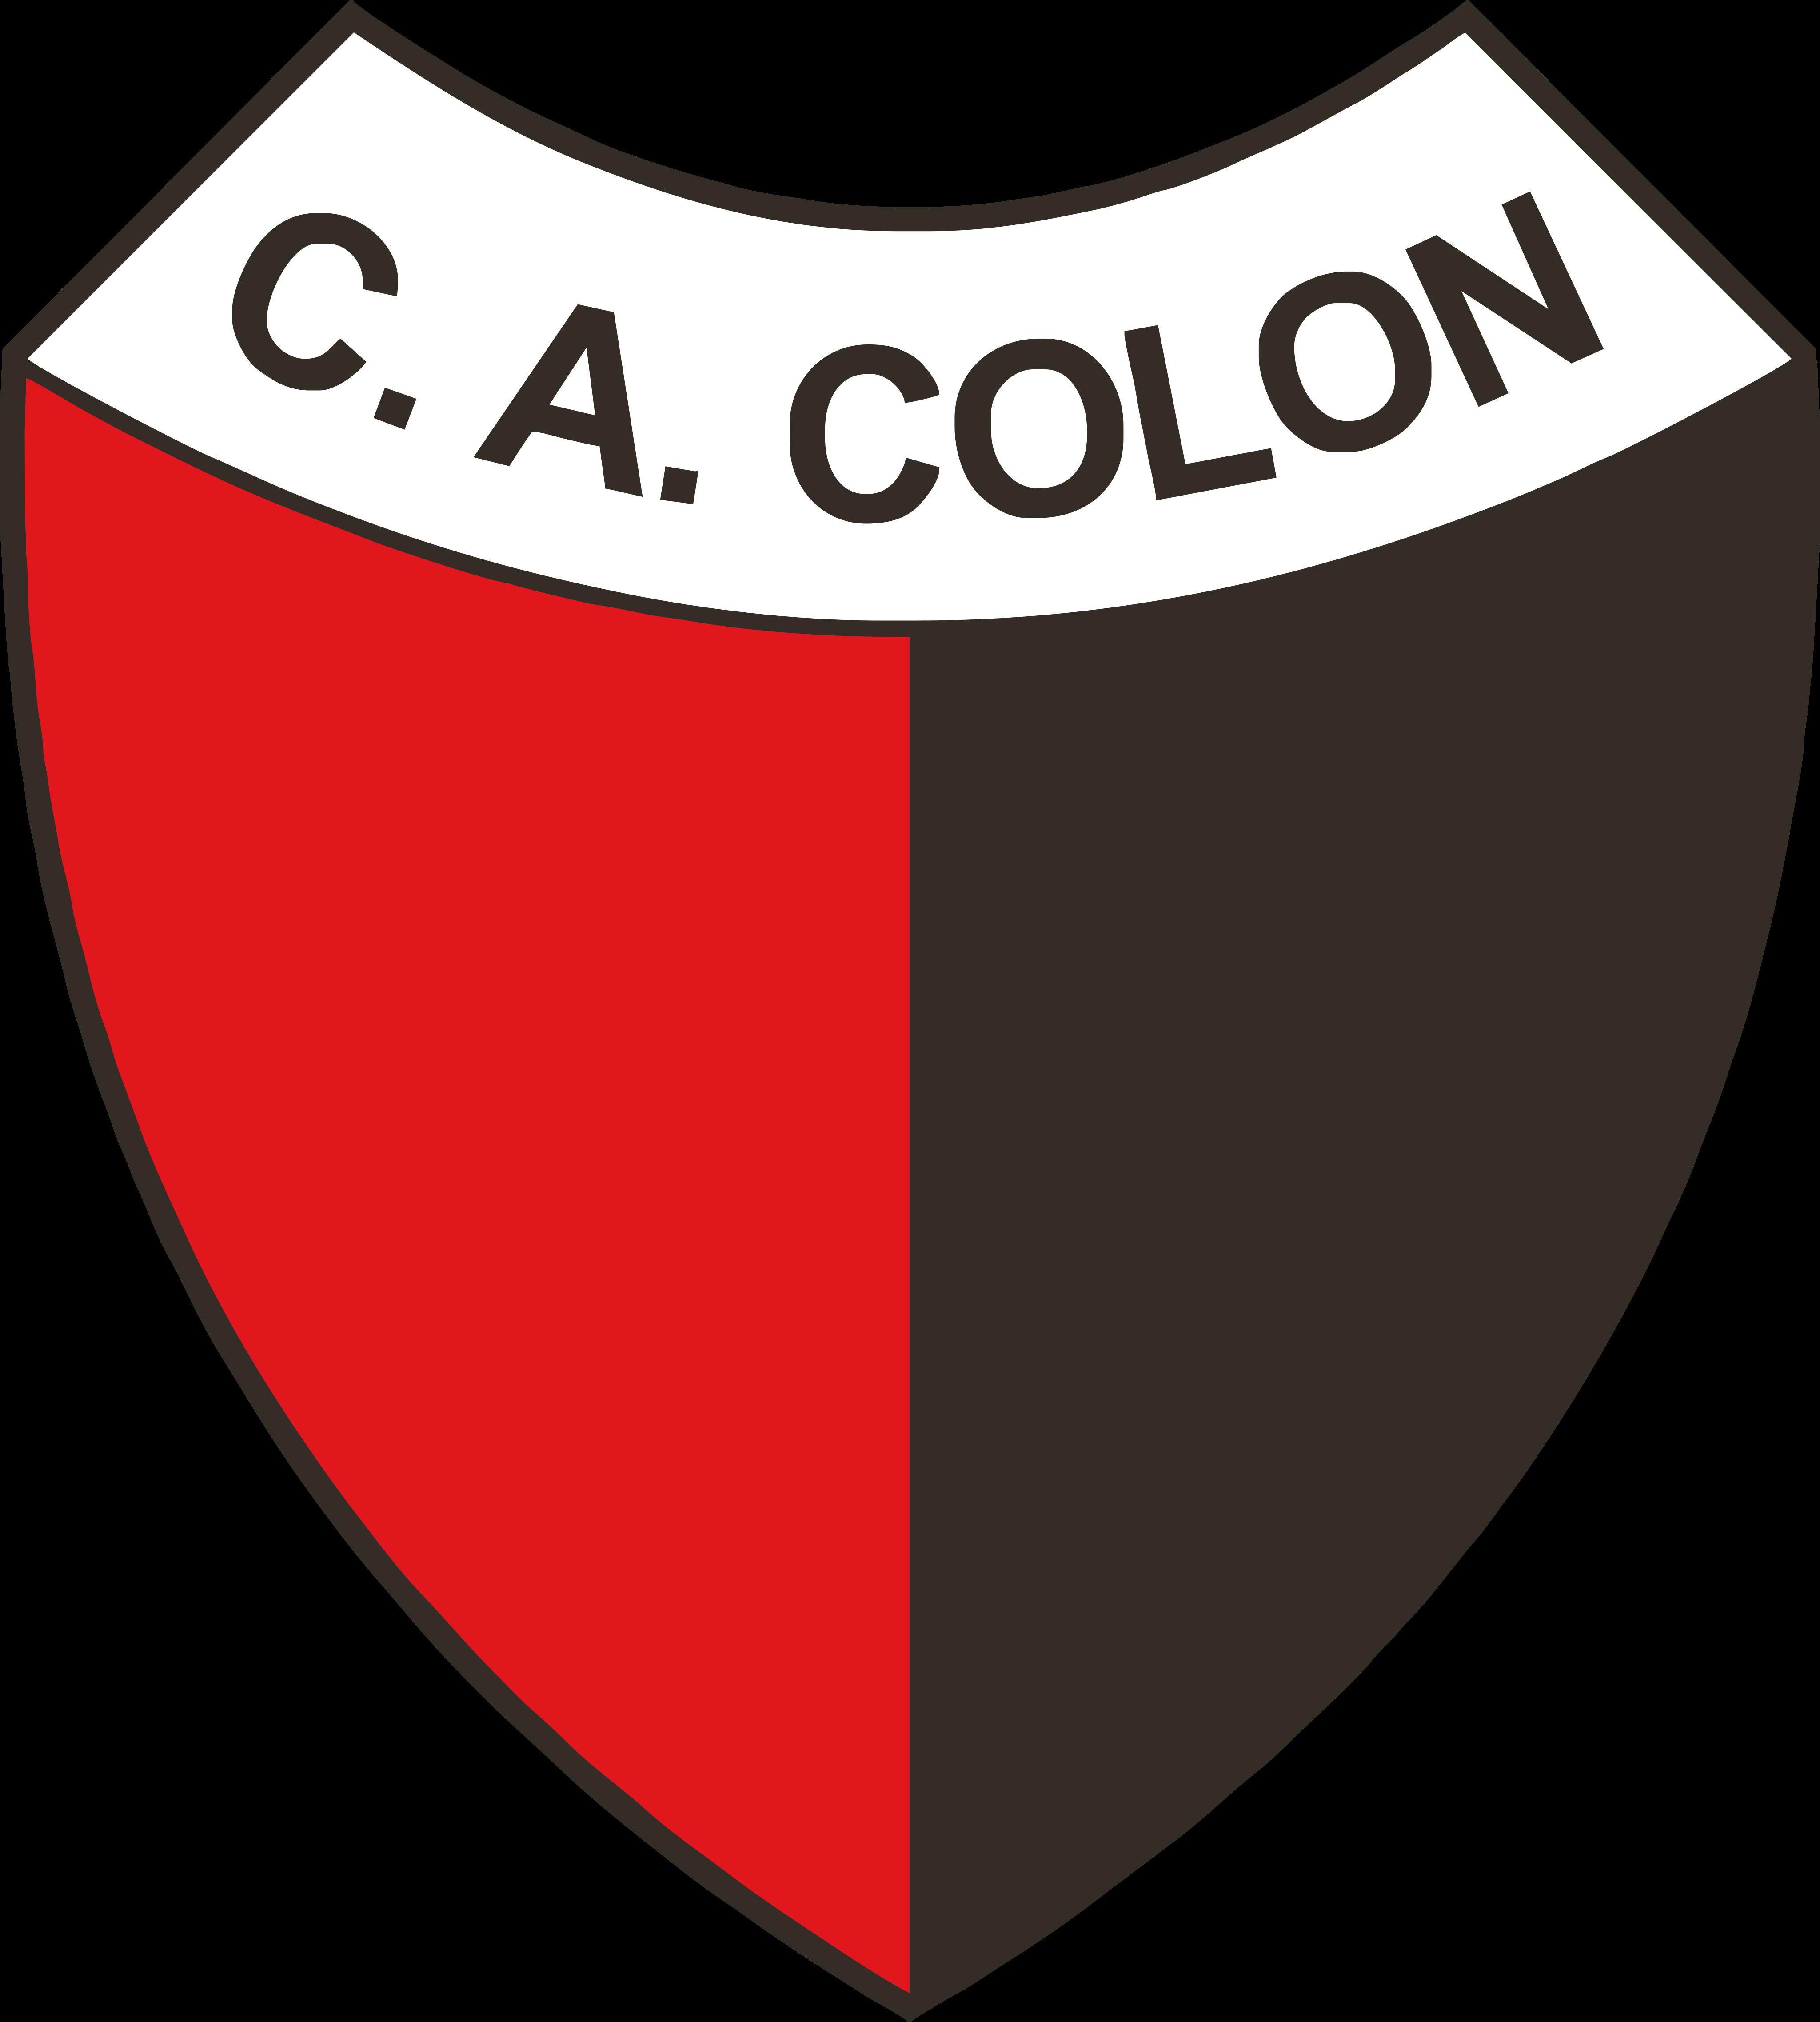 c a colon logo - Club Atlético Colón Logo